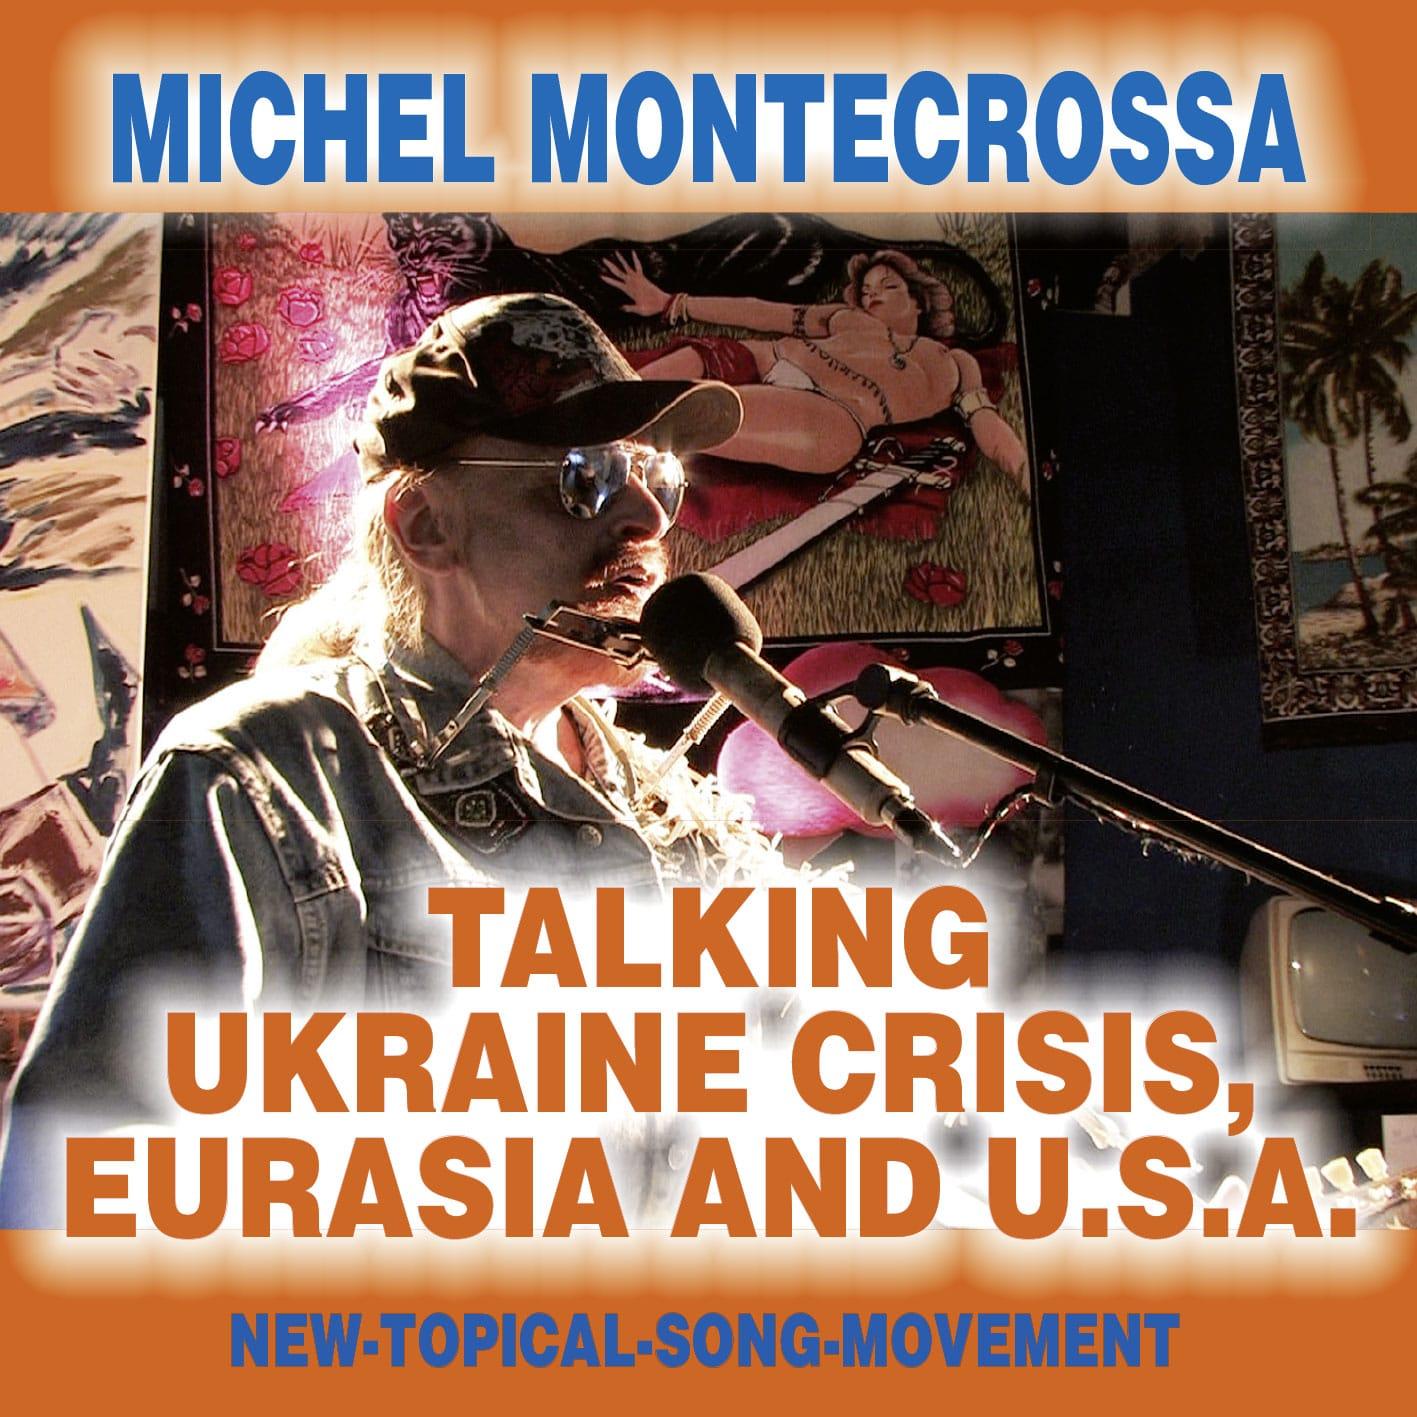 Talking Ukraine Crisis, Eurasia and U.S.A.